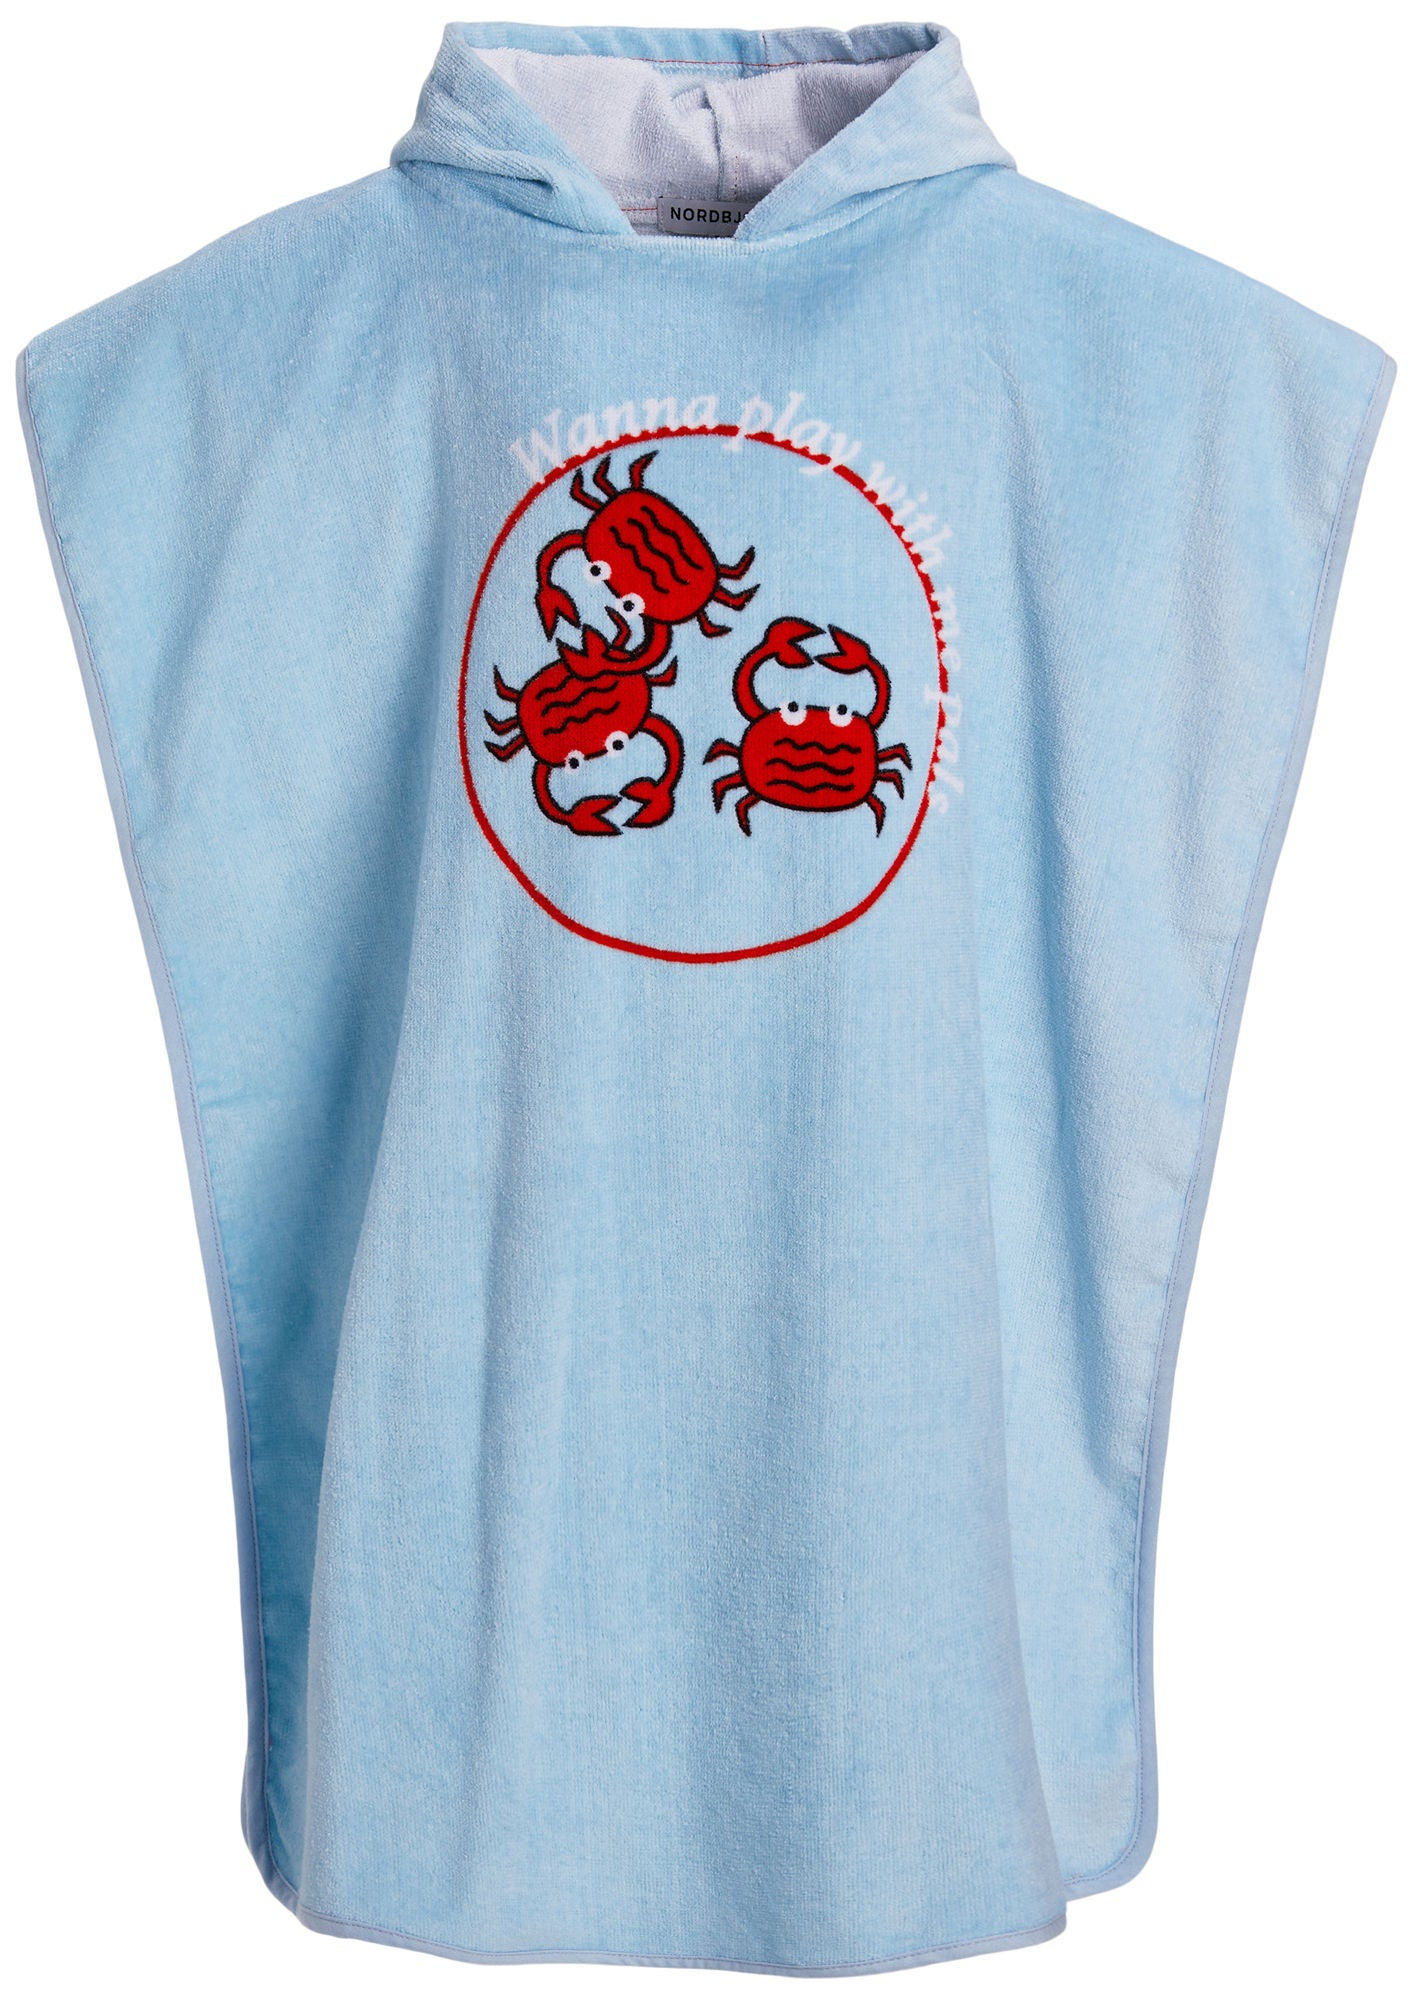 Nordbjörn Rossö Badponcho, Blue Crab, S